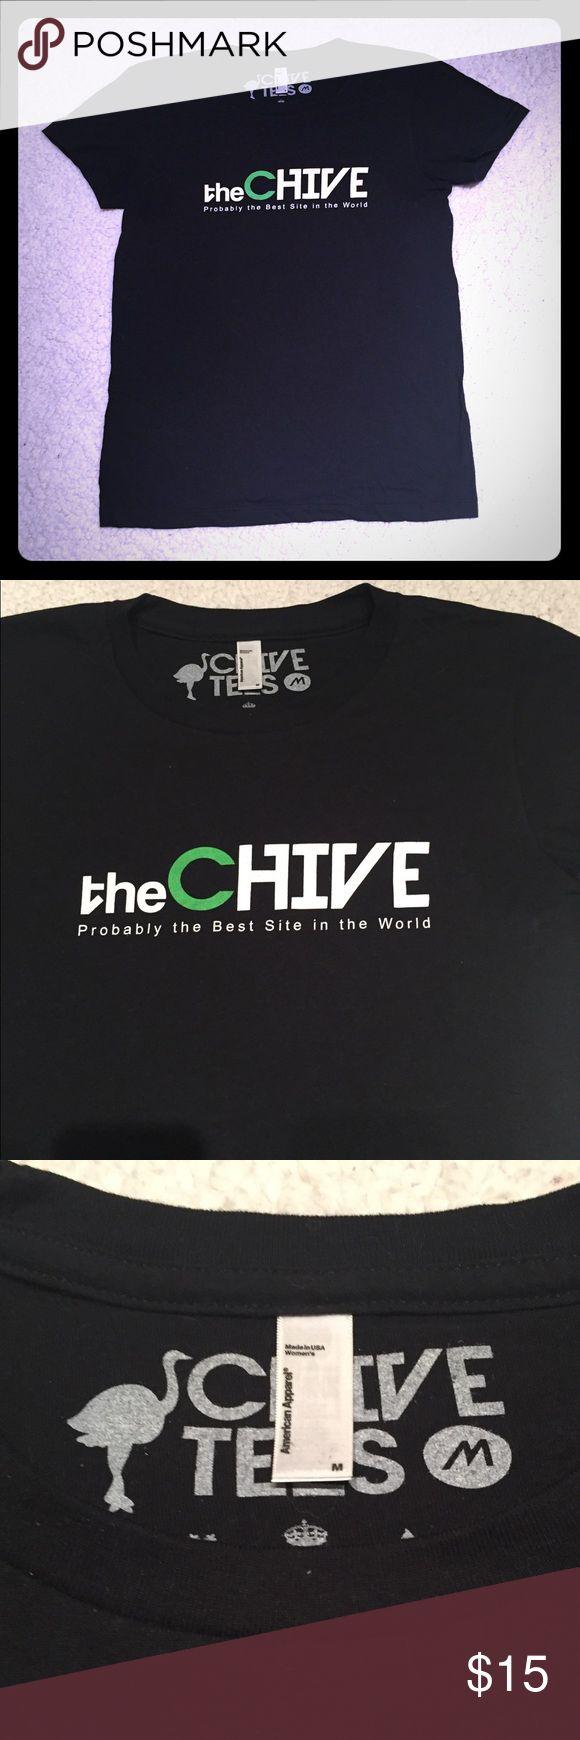 Best 25+ Chive shirt ideas on Pinterest | Pork and chive dumplings ...